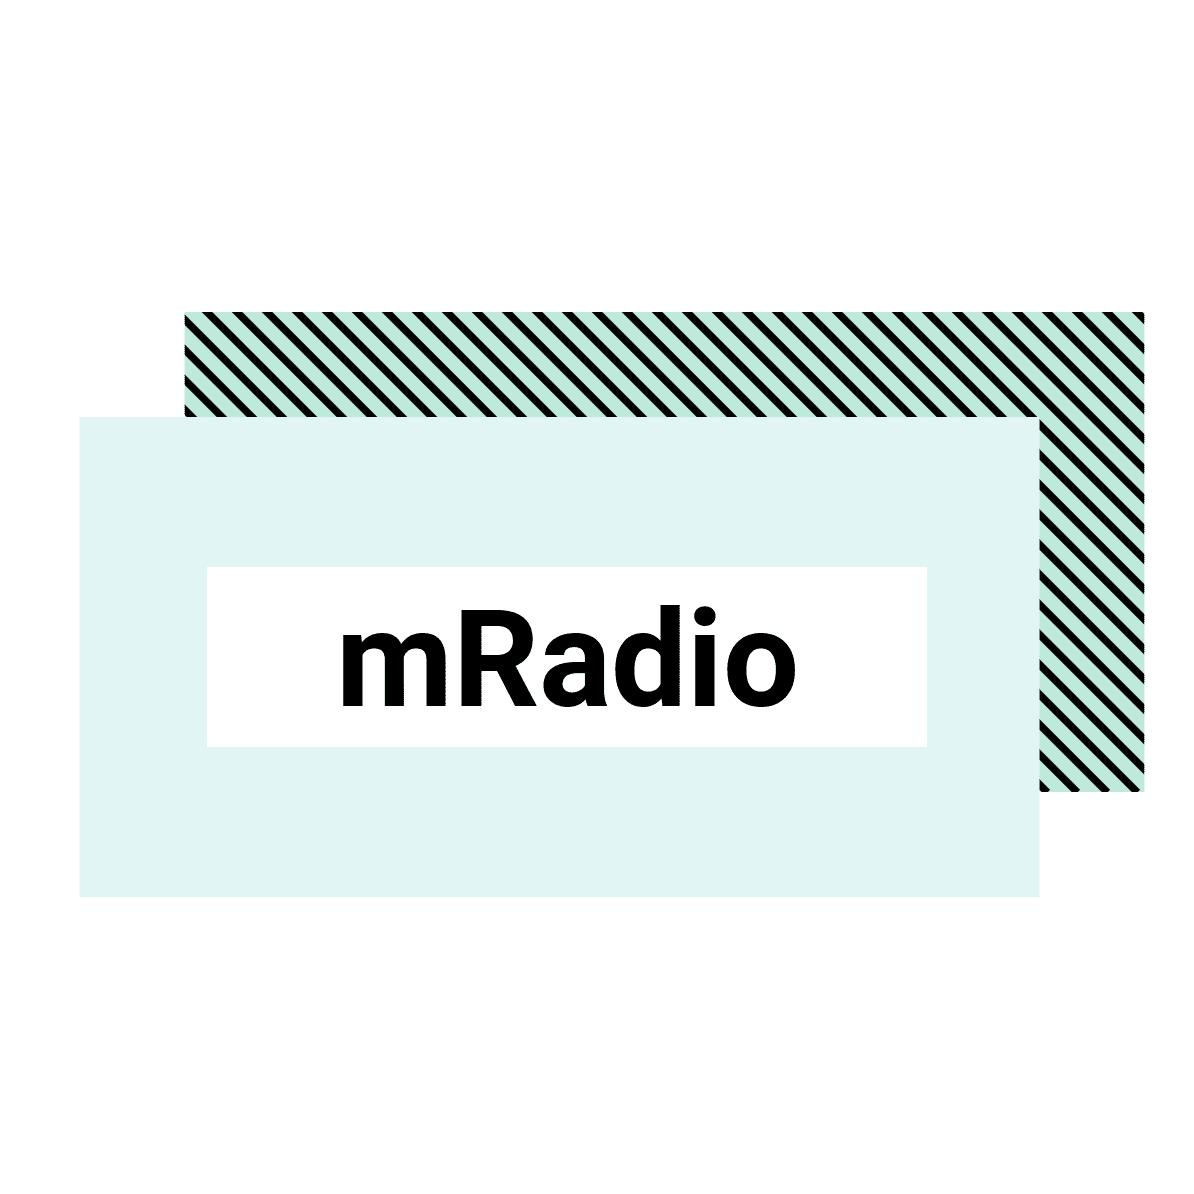 mRadio